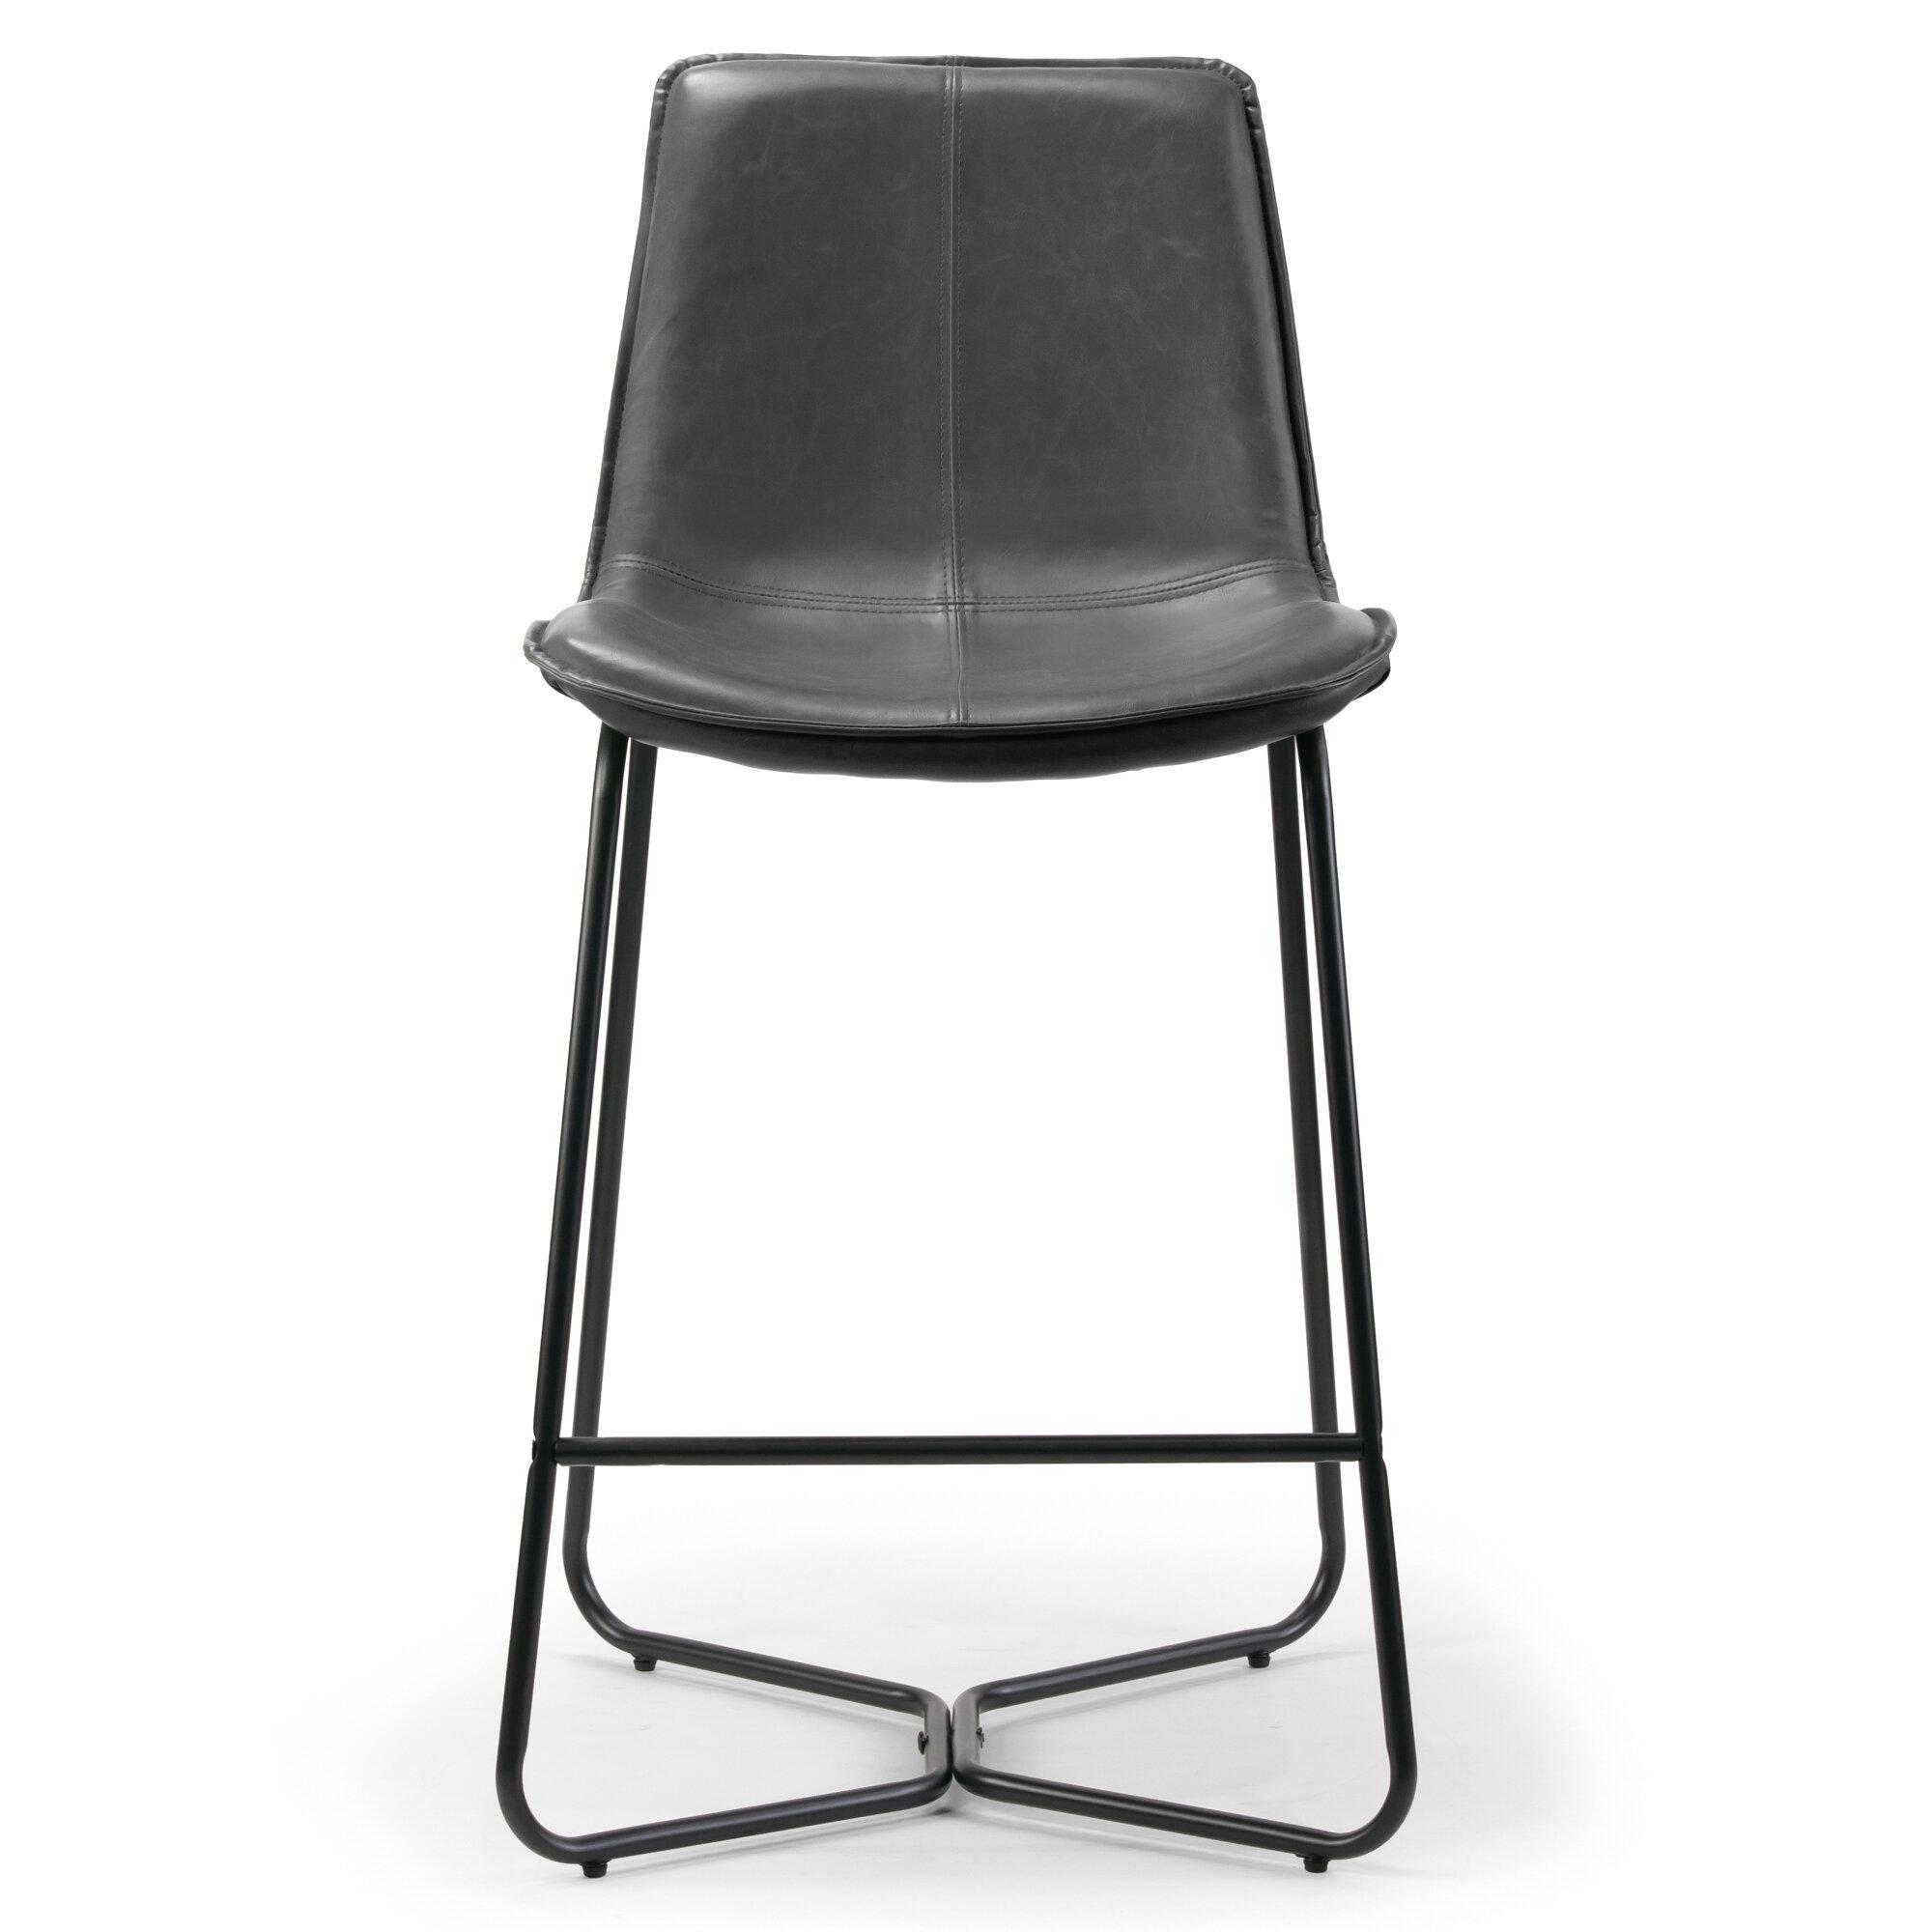 Miraculous Burke Counter Bar Stool Bralicious Painted Fabric Chair Ideas Braliciousco